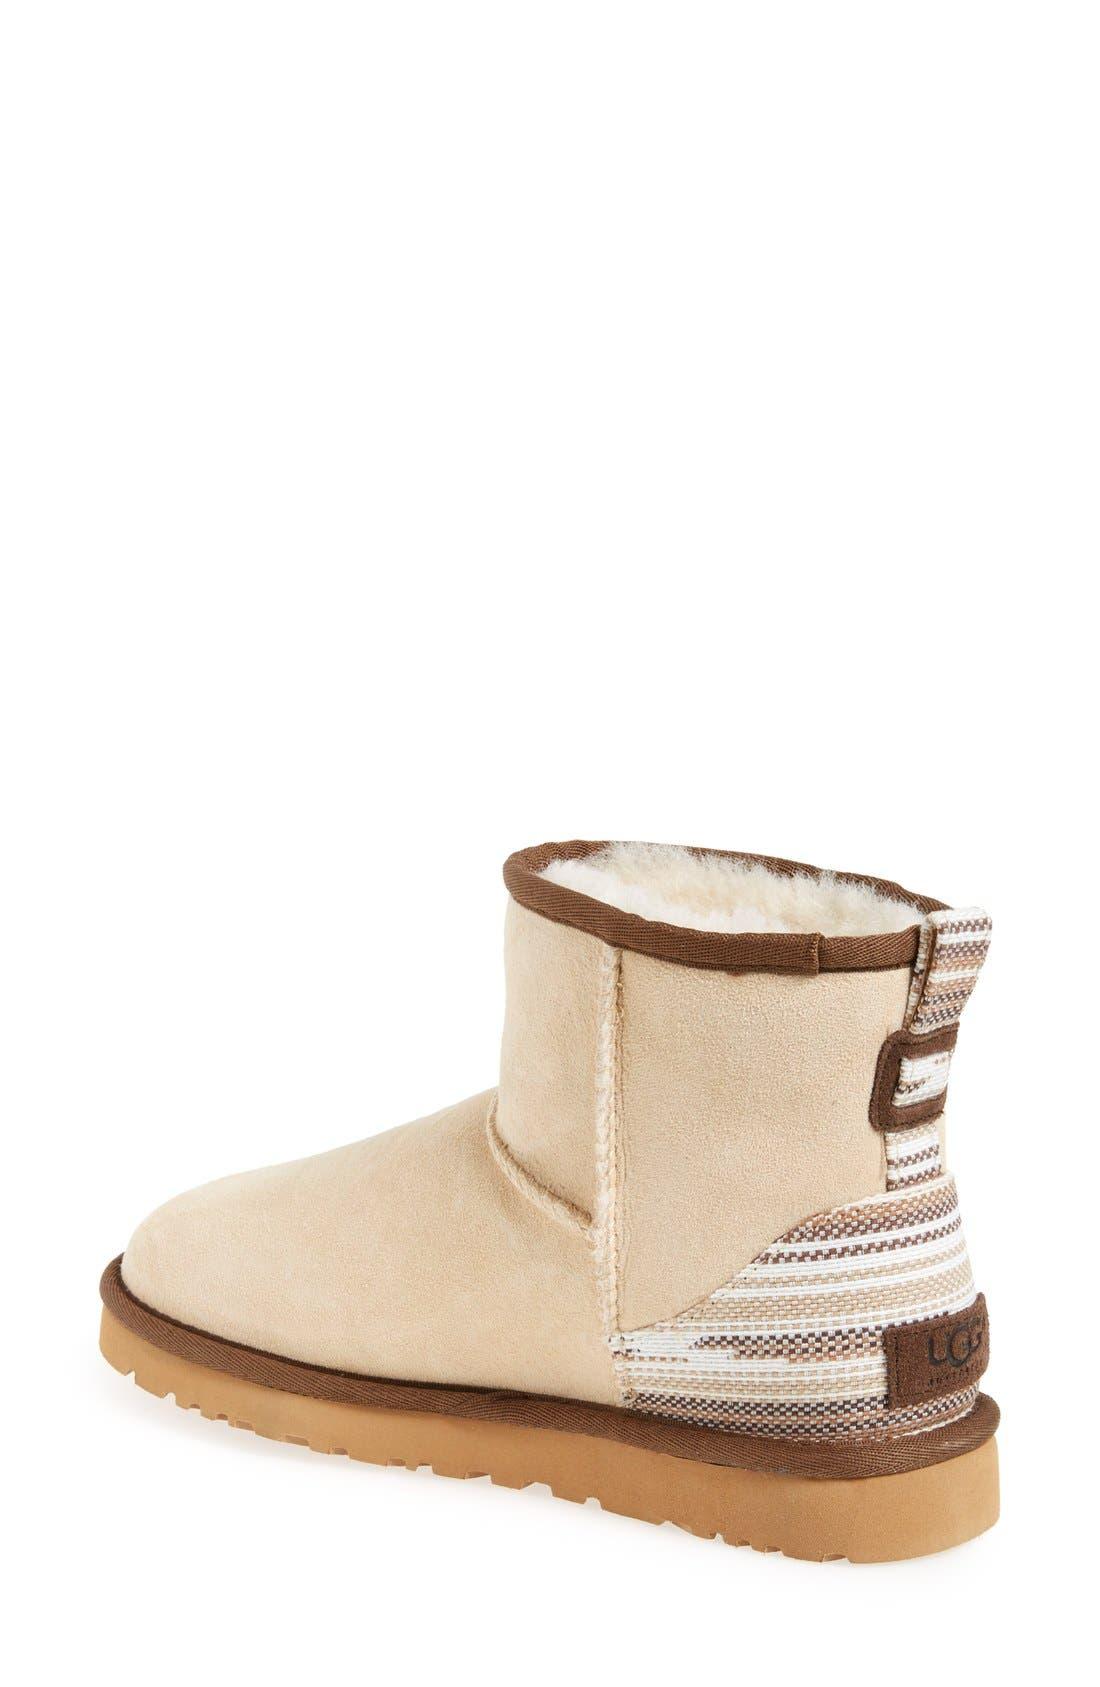 Alternate Image 2  - UGG® 'Classic Mini Serape' Genuine Shearling Lined Boot (Women)